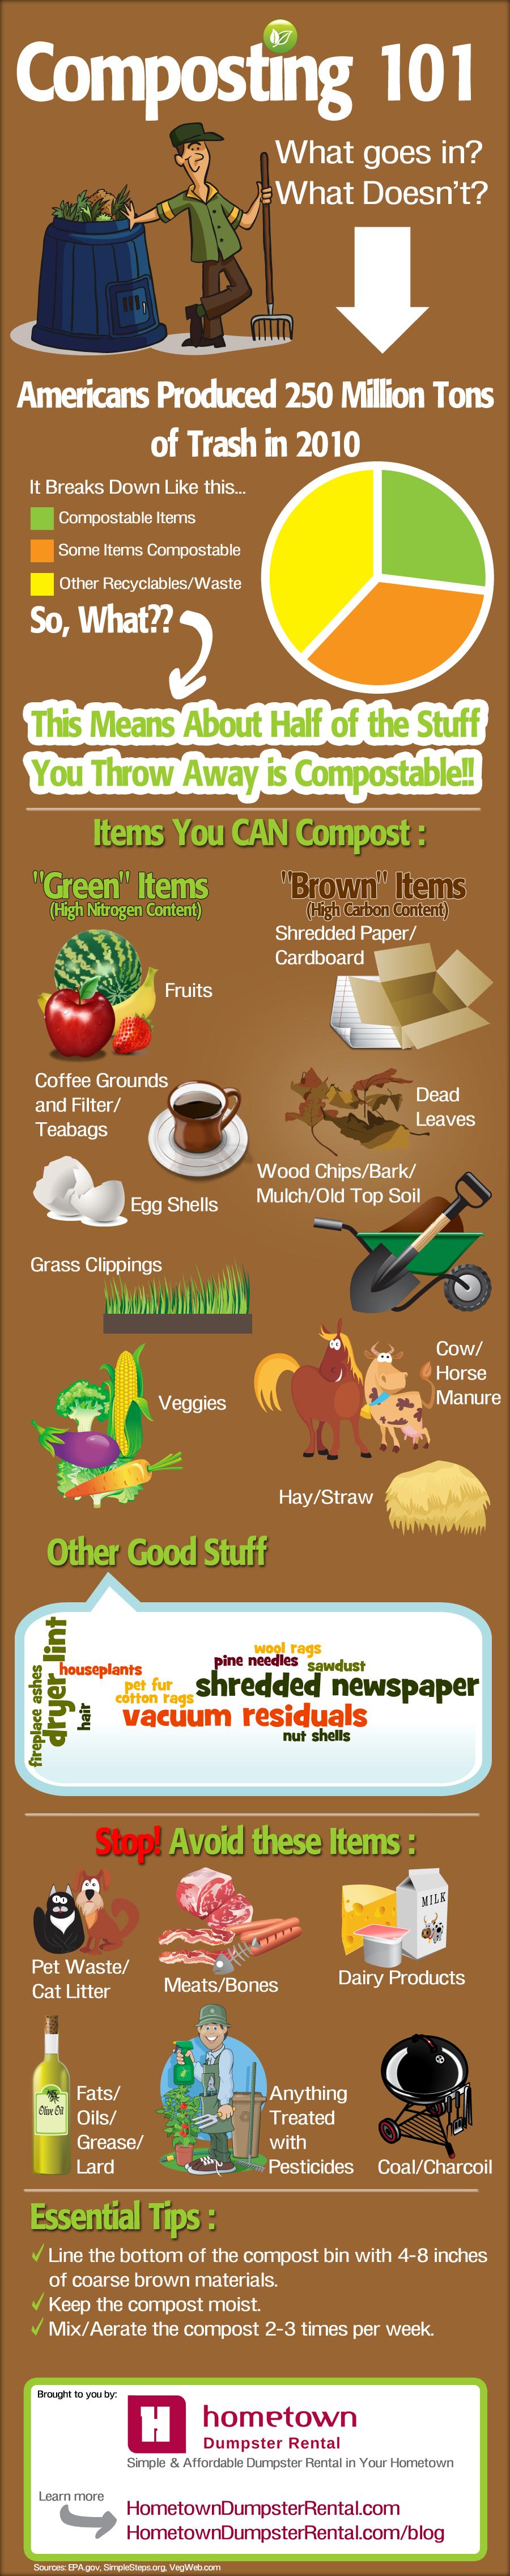 Composting! Trash Talk